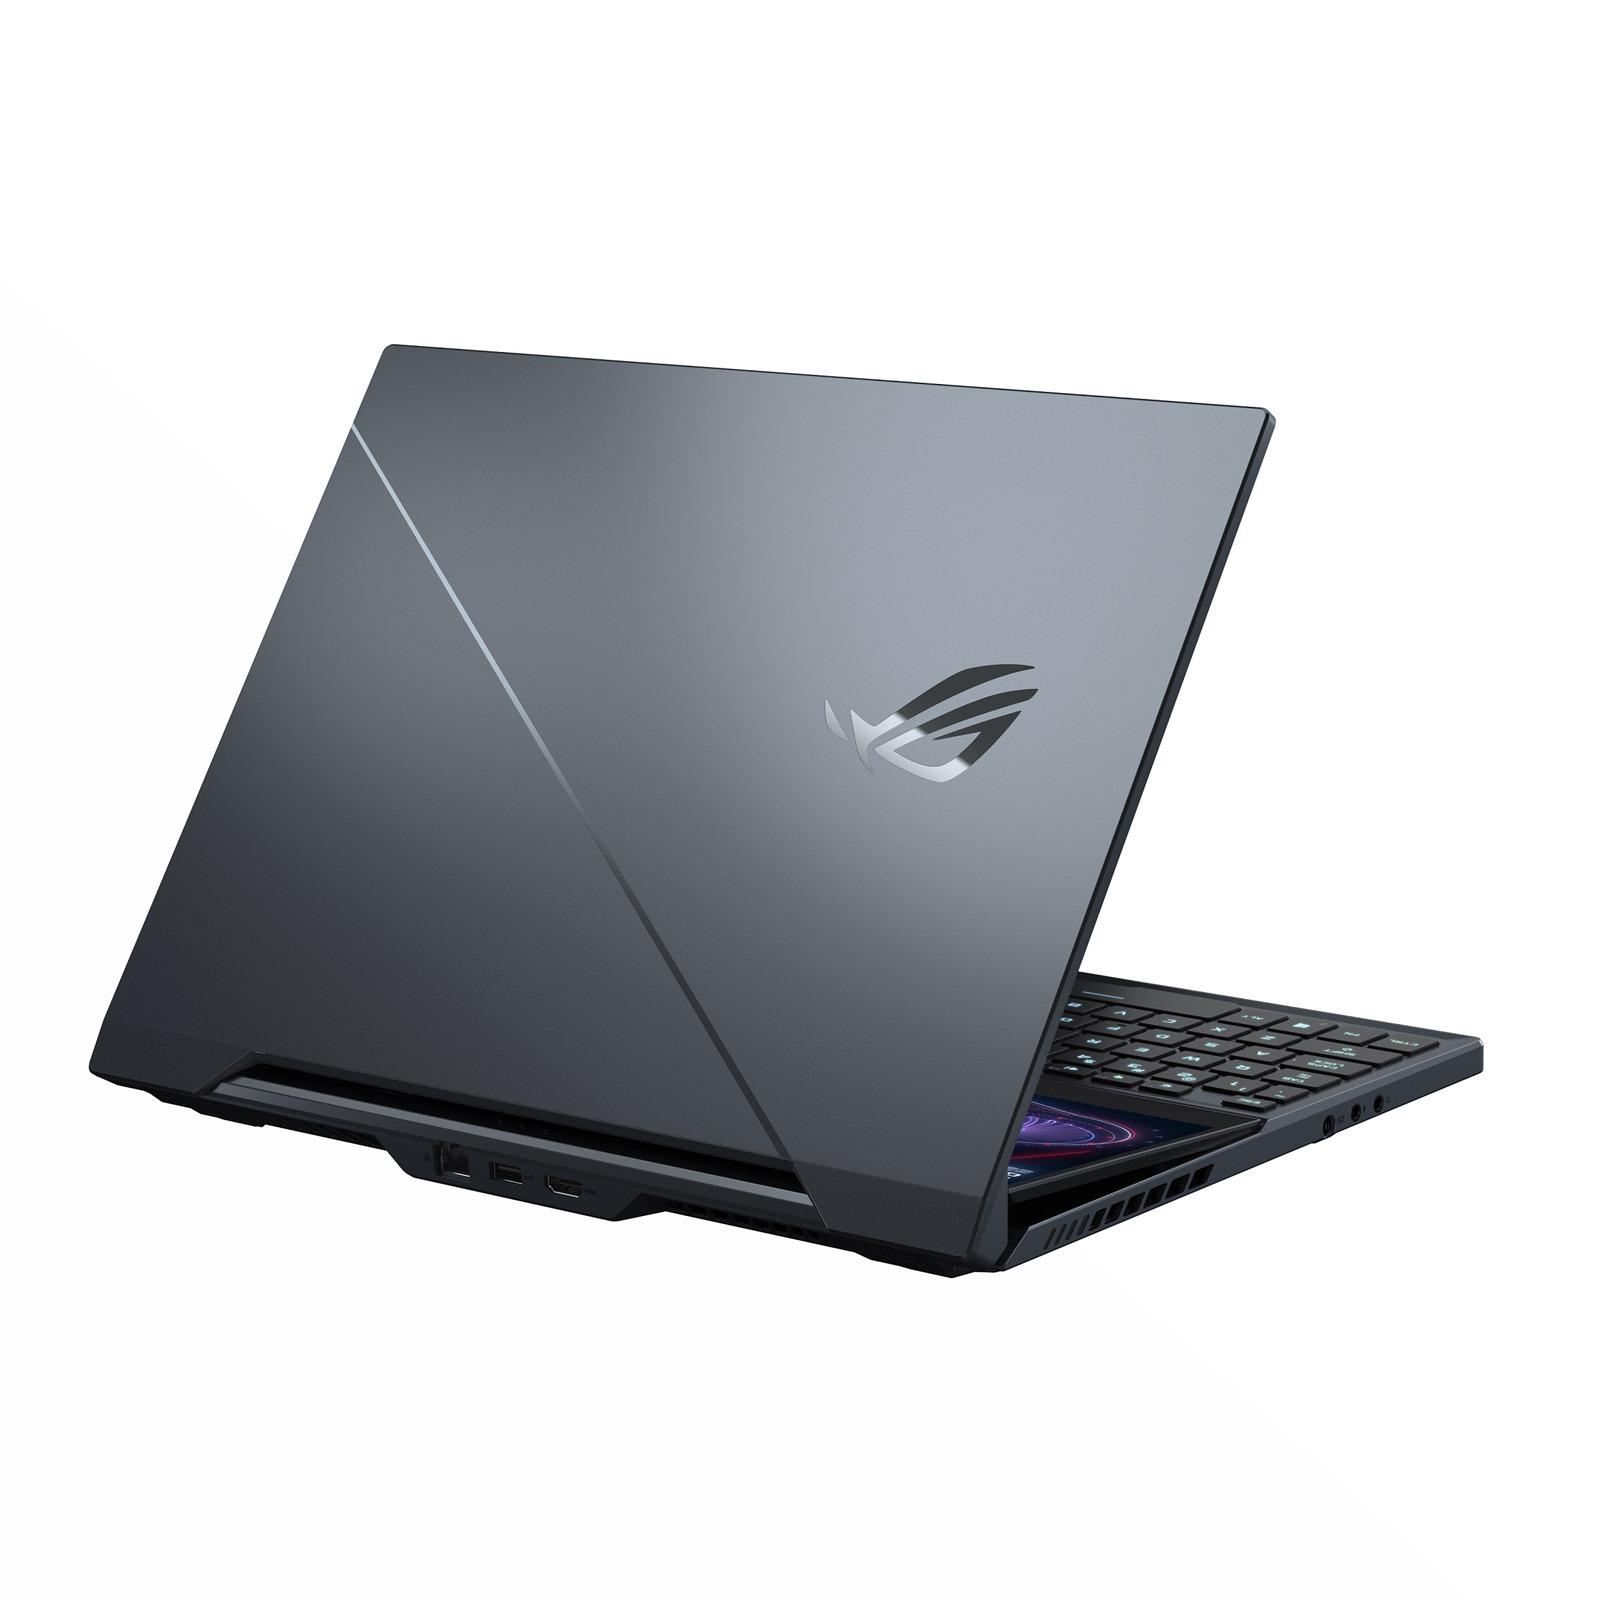 ROG 新世代電競筆電搭載最新第十代 Intel® Core™ H 系列處理器 重裝精銳強勢來襲! @3C 達人廖阿輝